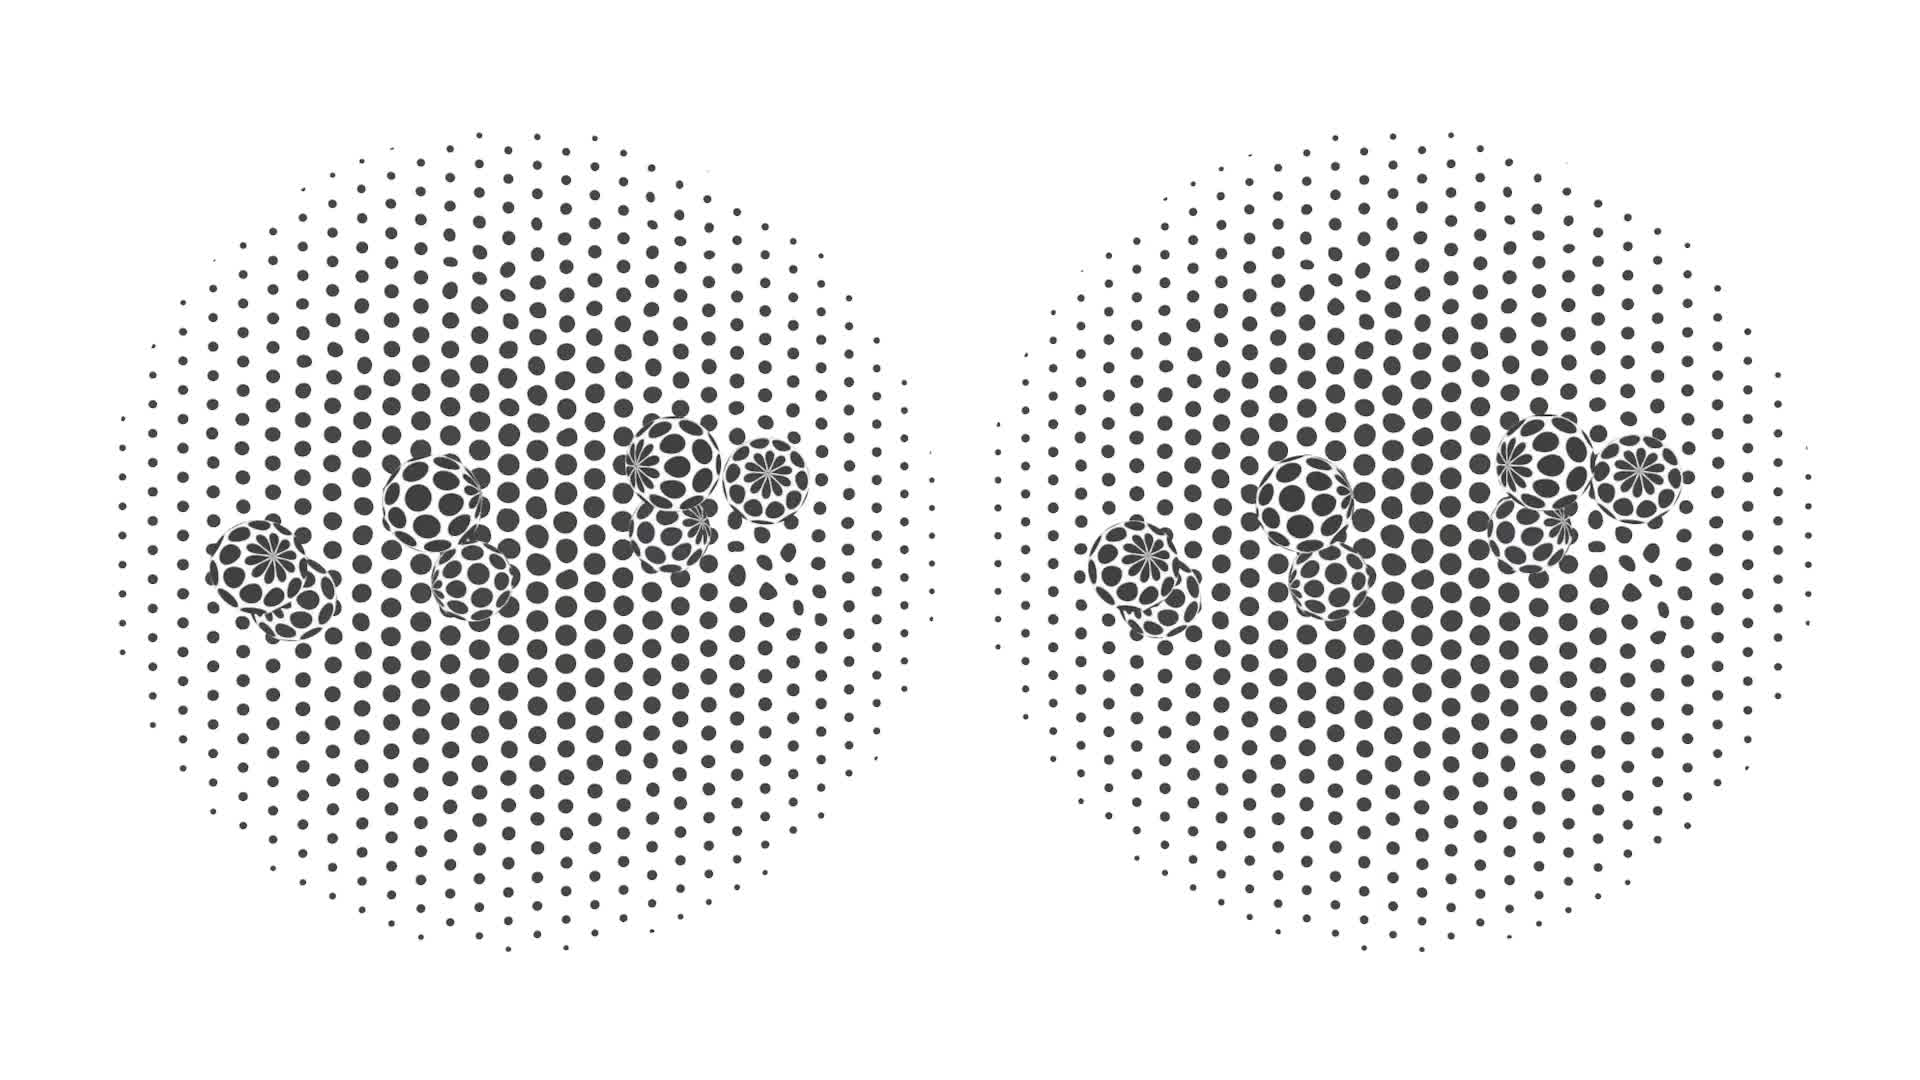 3d, HdenebH, animation, crosseye, crosseye3d, crosseyed, crossview, looping, stereoscopic, yt:quality=high, Stereoscopic 3d animation - crossview GIFs